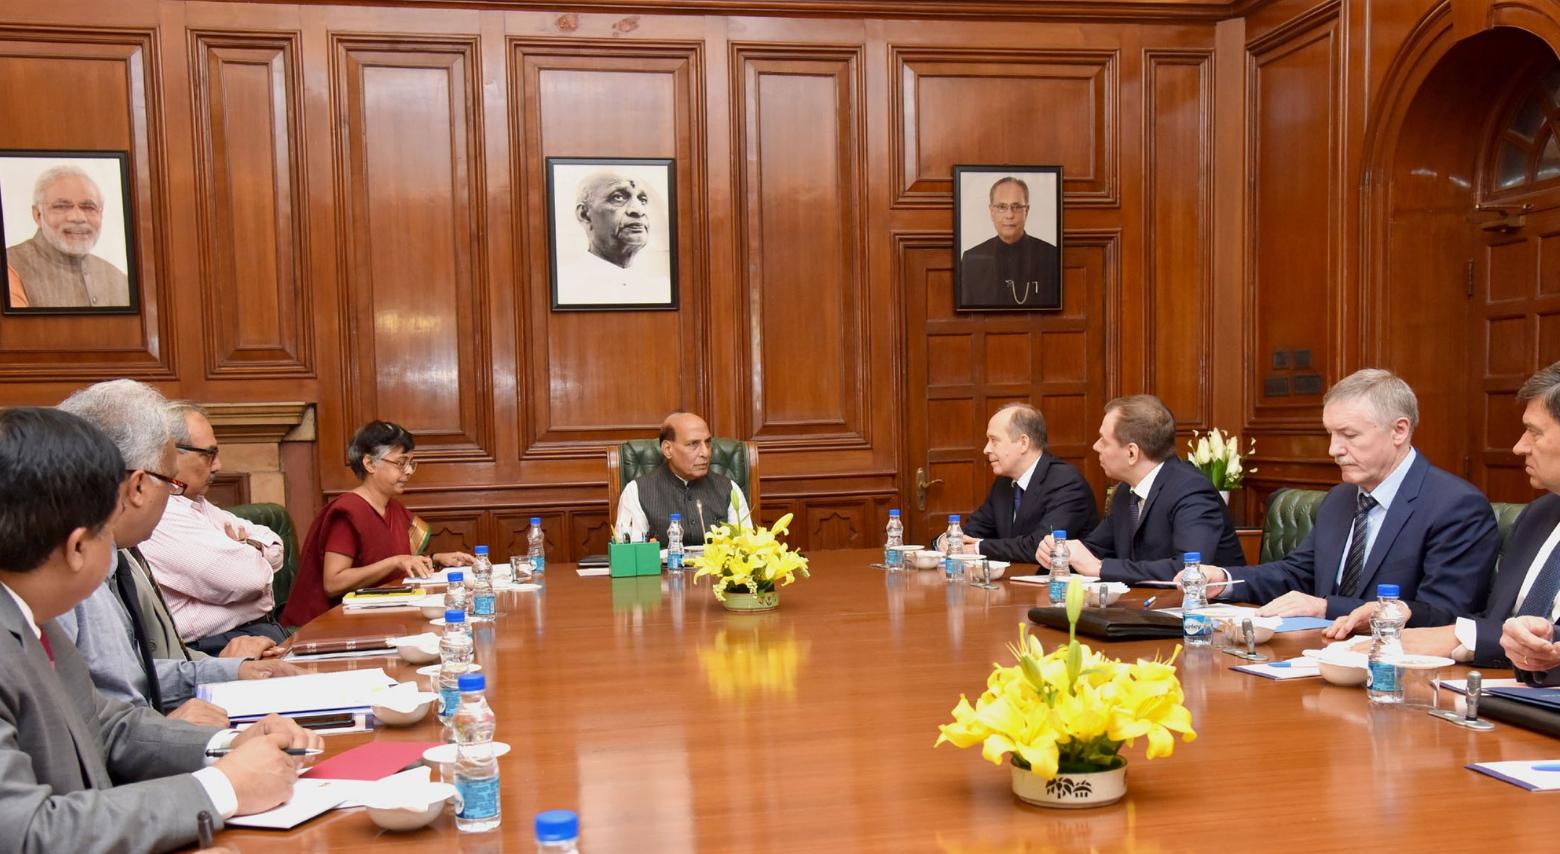 Talks between Rajnath Singh and the FSB leadership. Source: twitter@MIB_India